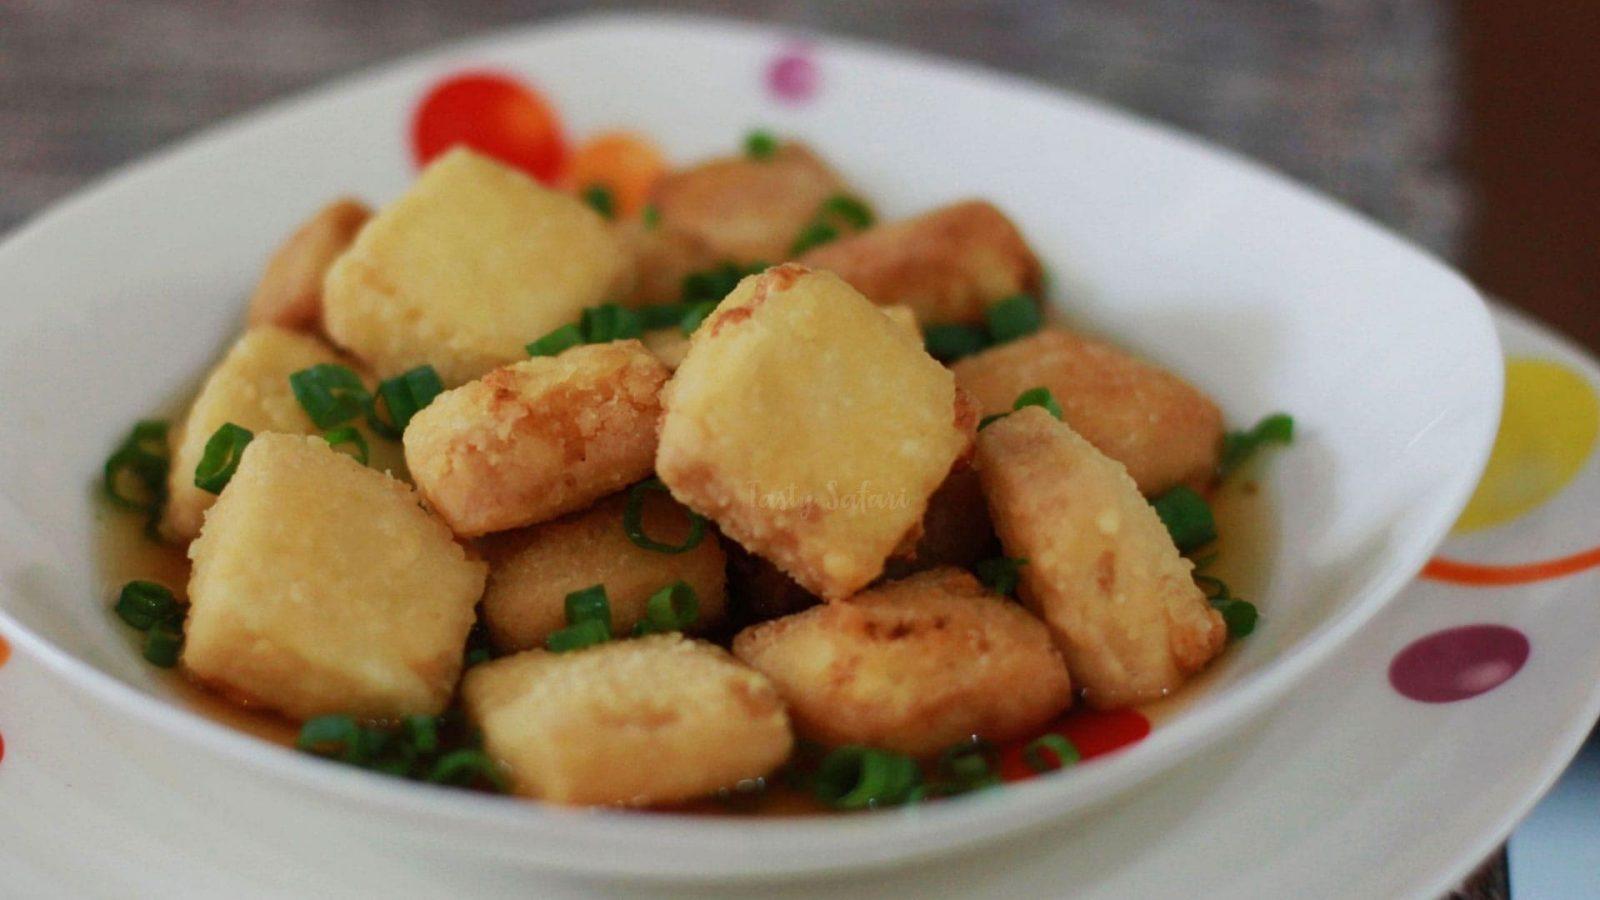 Agedashi tofu recipe for home cooking